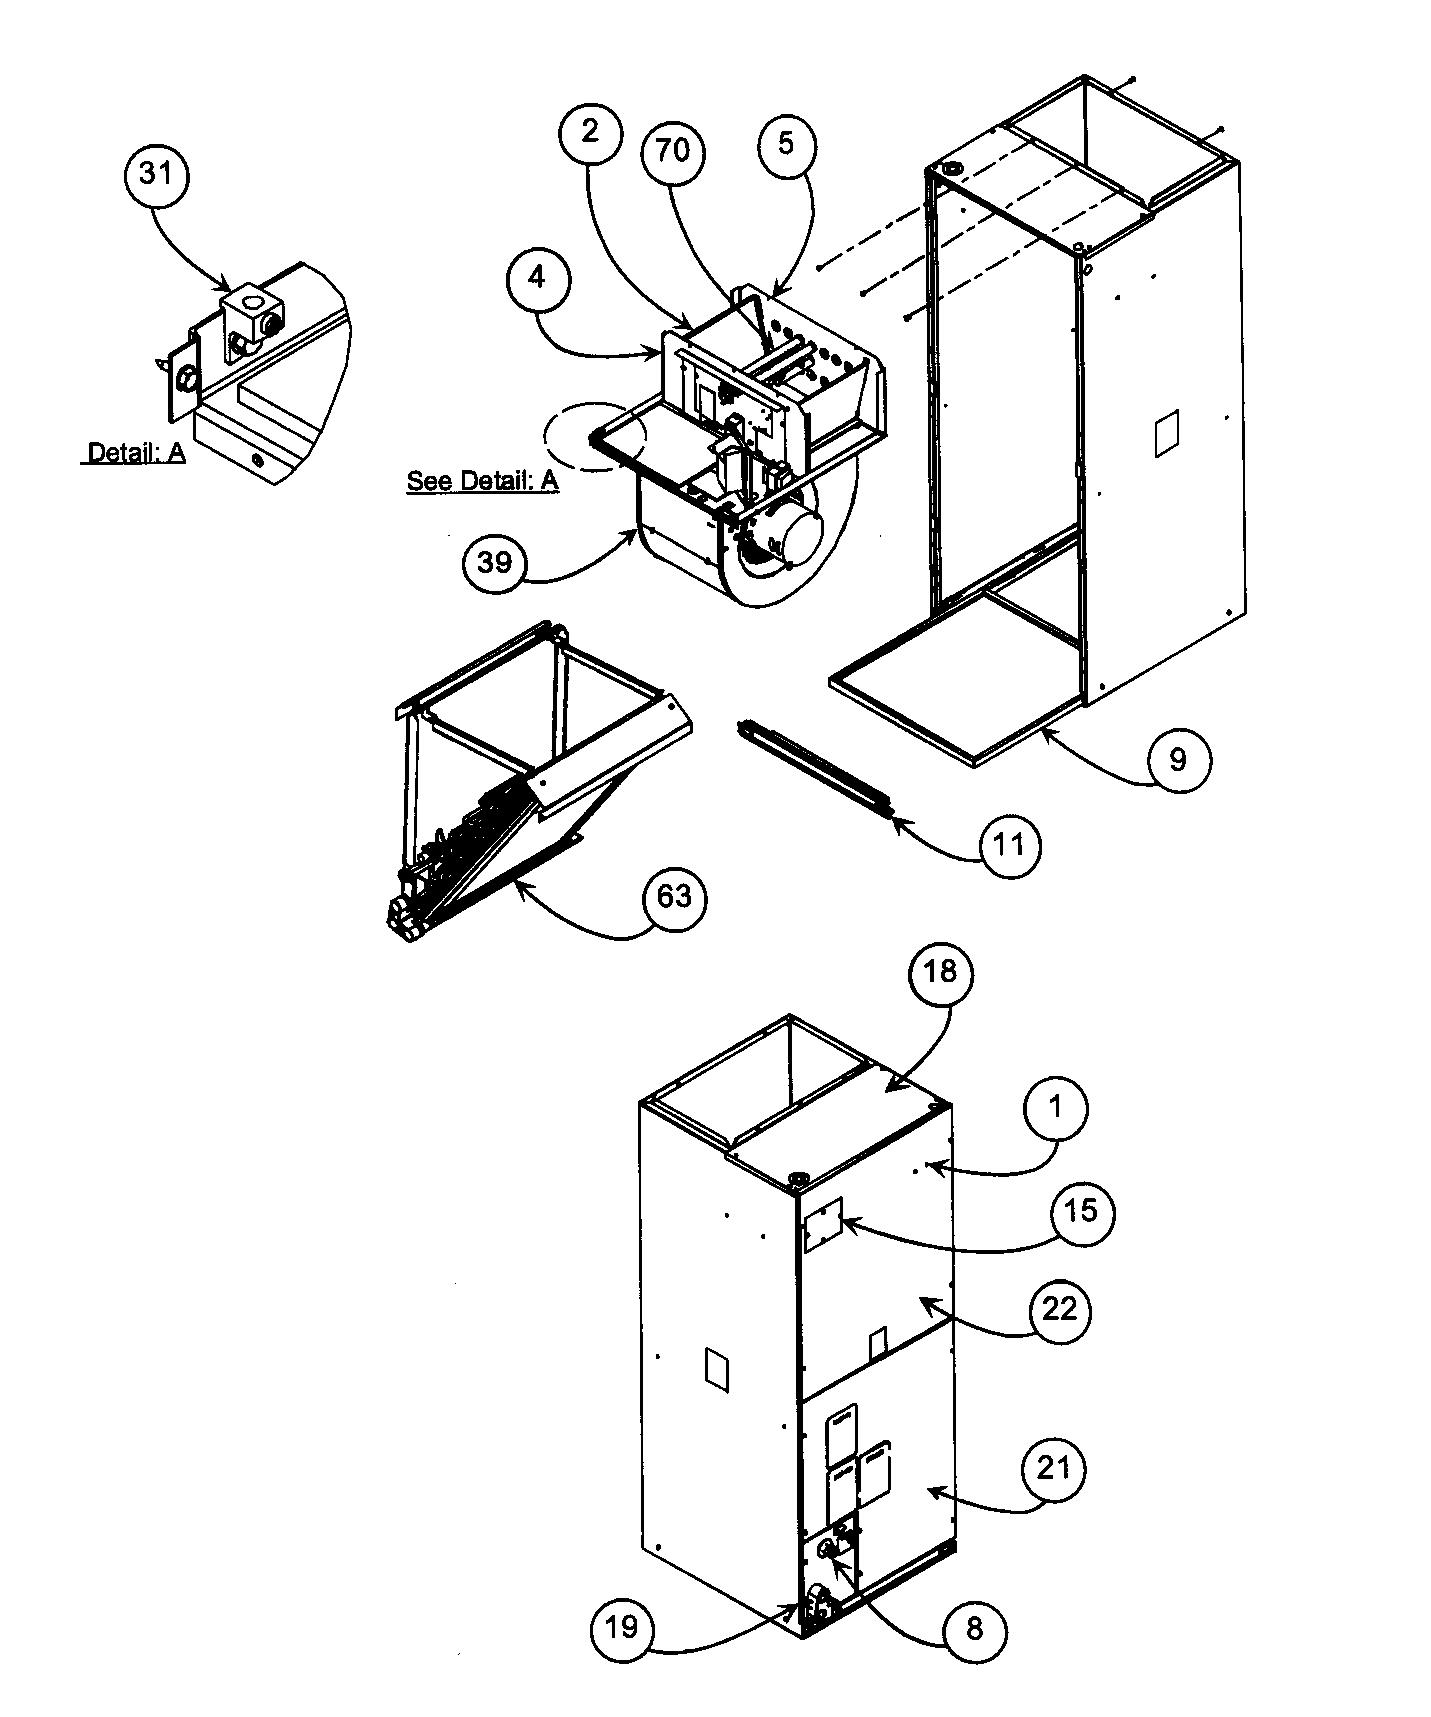 York Millennium Schematics Y14 Auto Electrical Wiring Diagram Related With